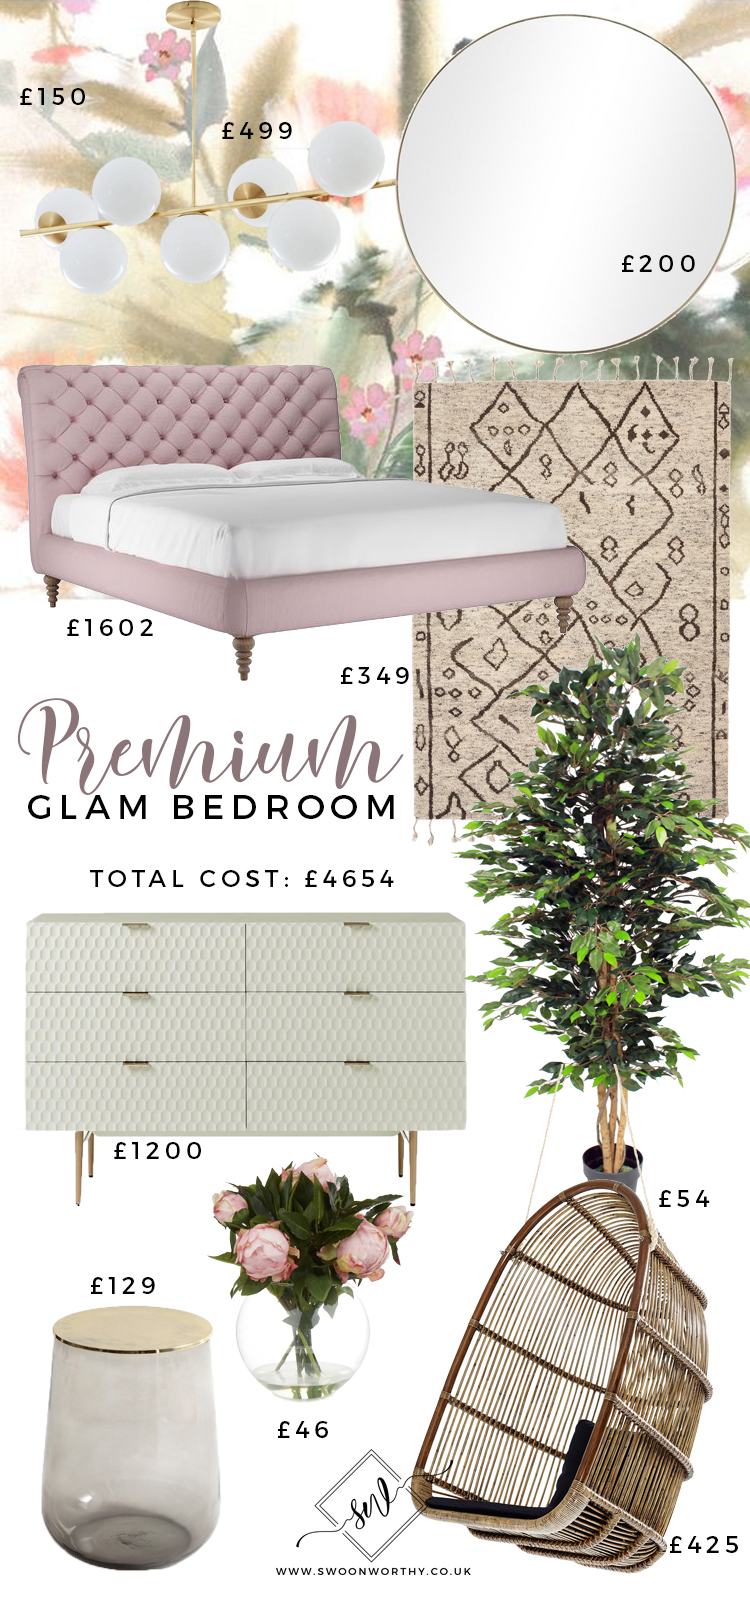 Premium Glam Bedroom - Total Price £4654